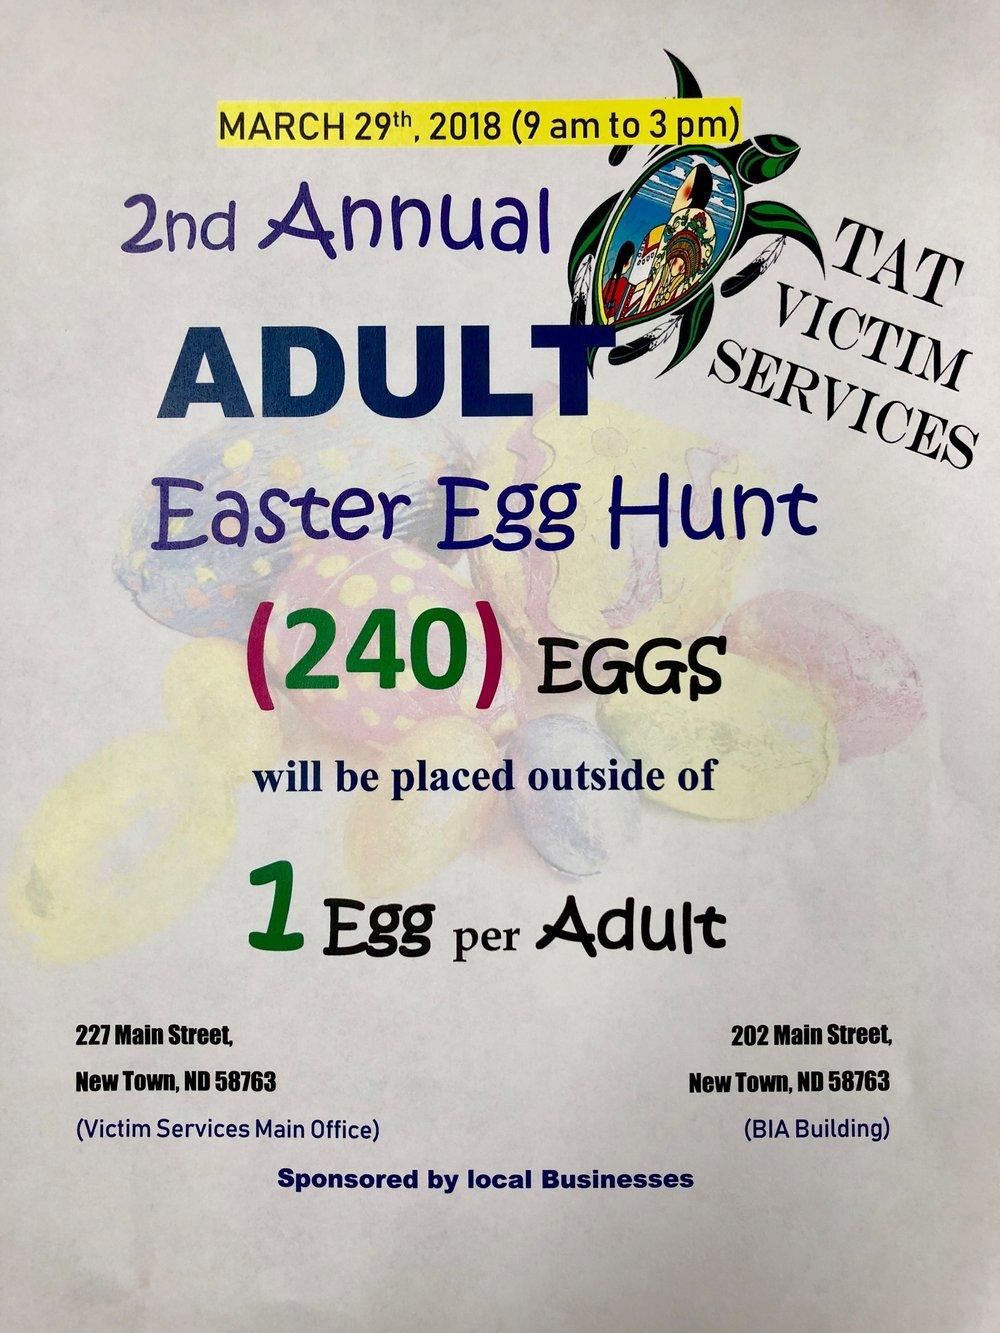 TAT Victim Services 2nd Annual Adult Easter Egg Hunt.jpg